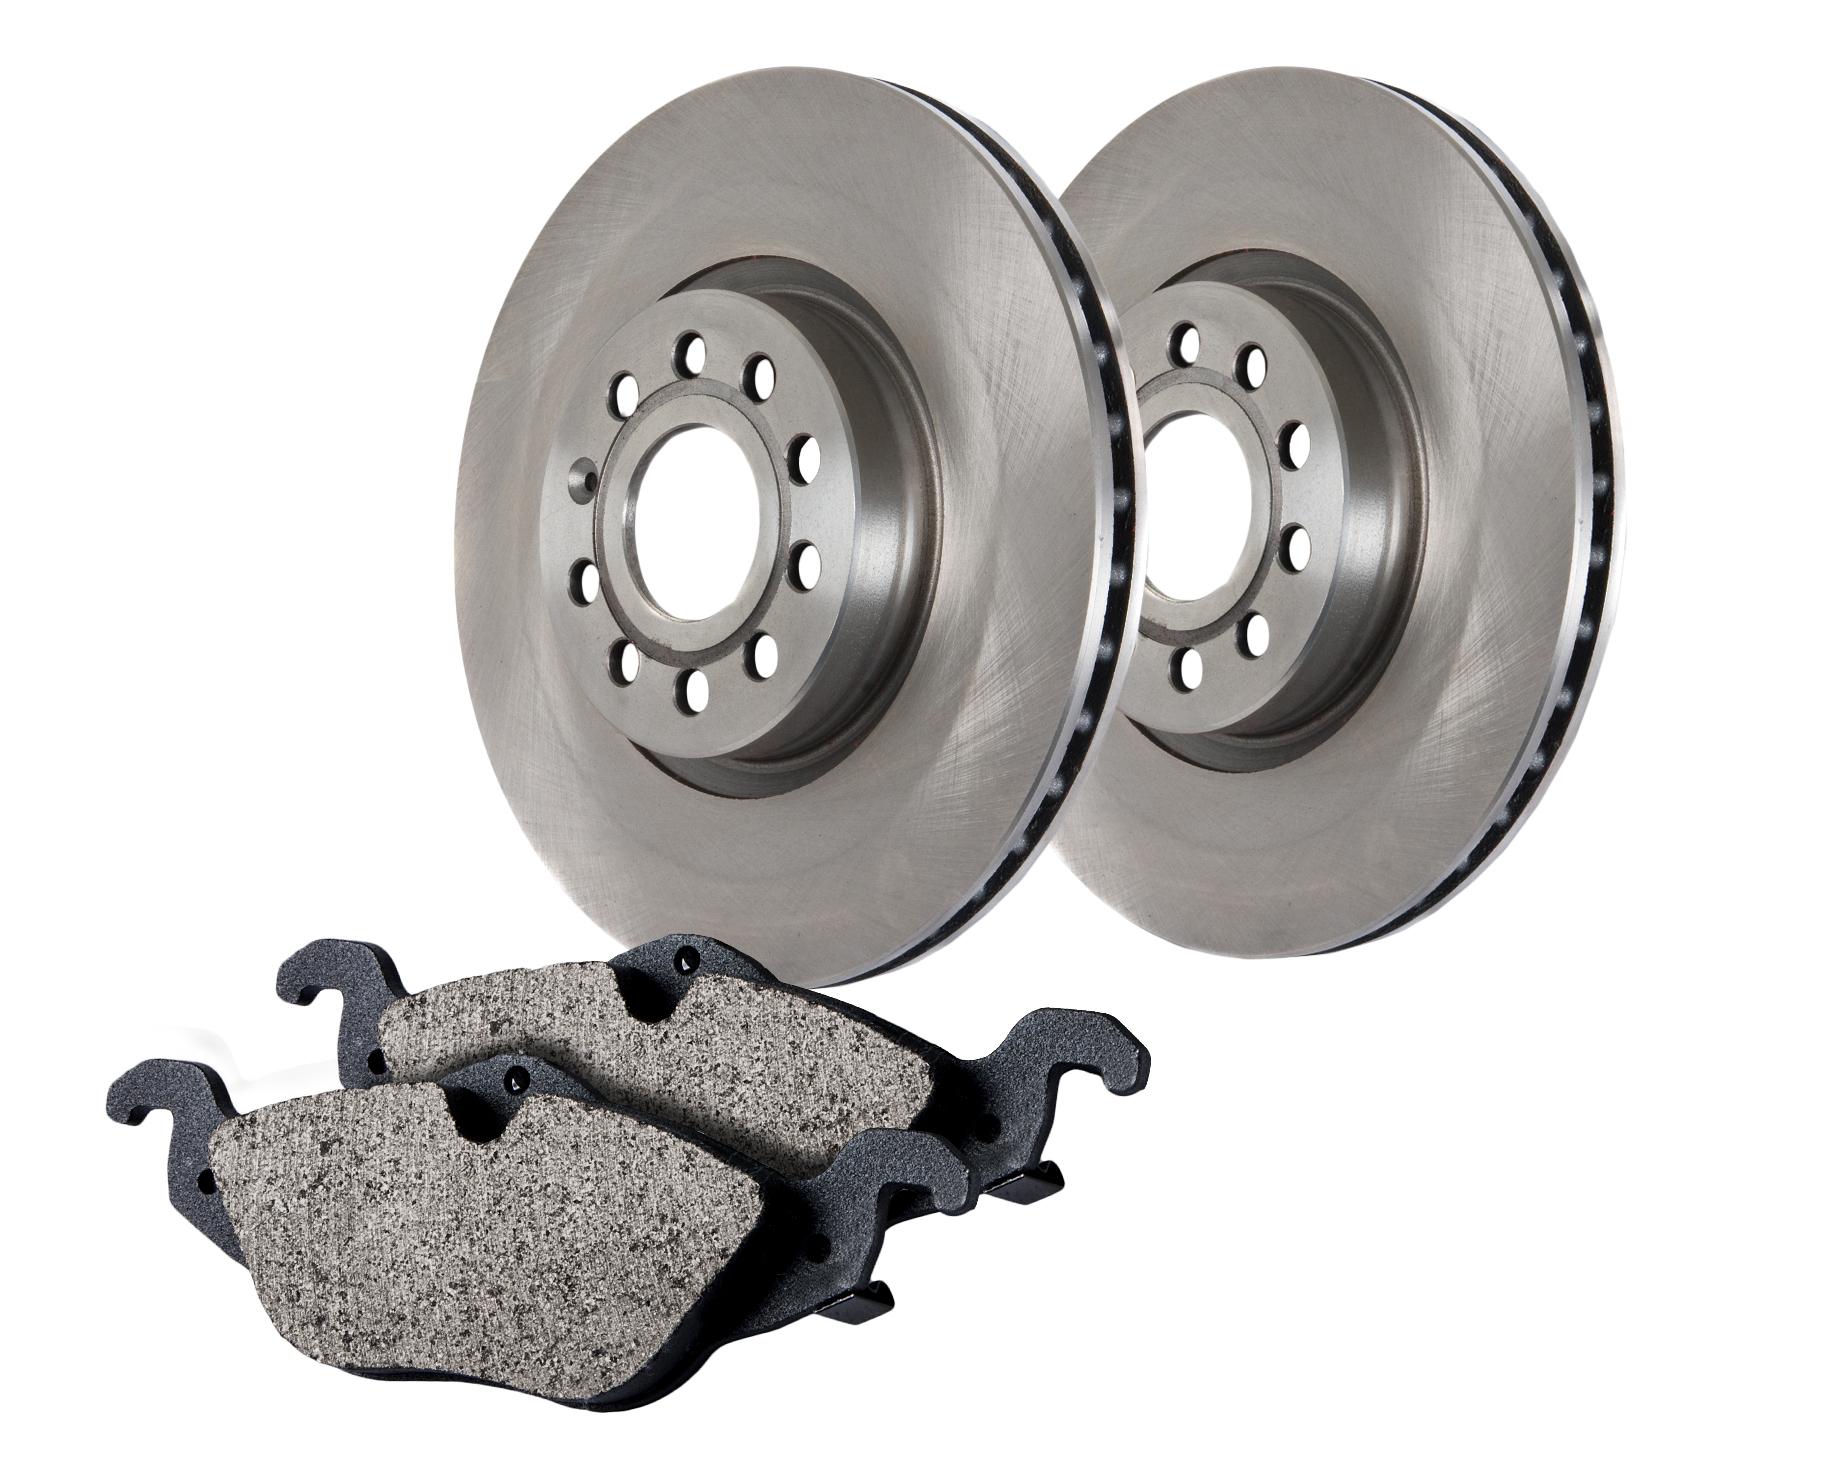 Centric Brake Parts 905.67003 Brake Rotor and Pad Kit, Premium, Semi-Metallic Pads, Iron, Natural, Mopar Minivan 2008-12, Kit